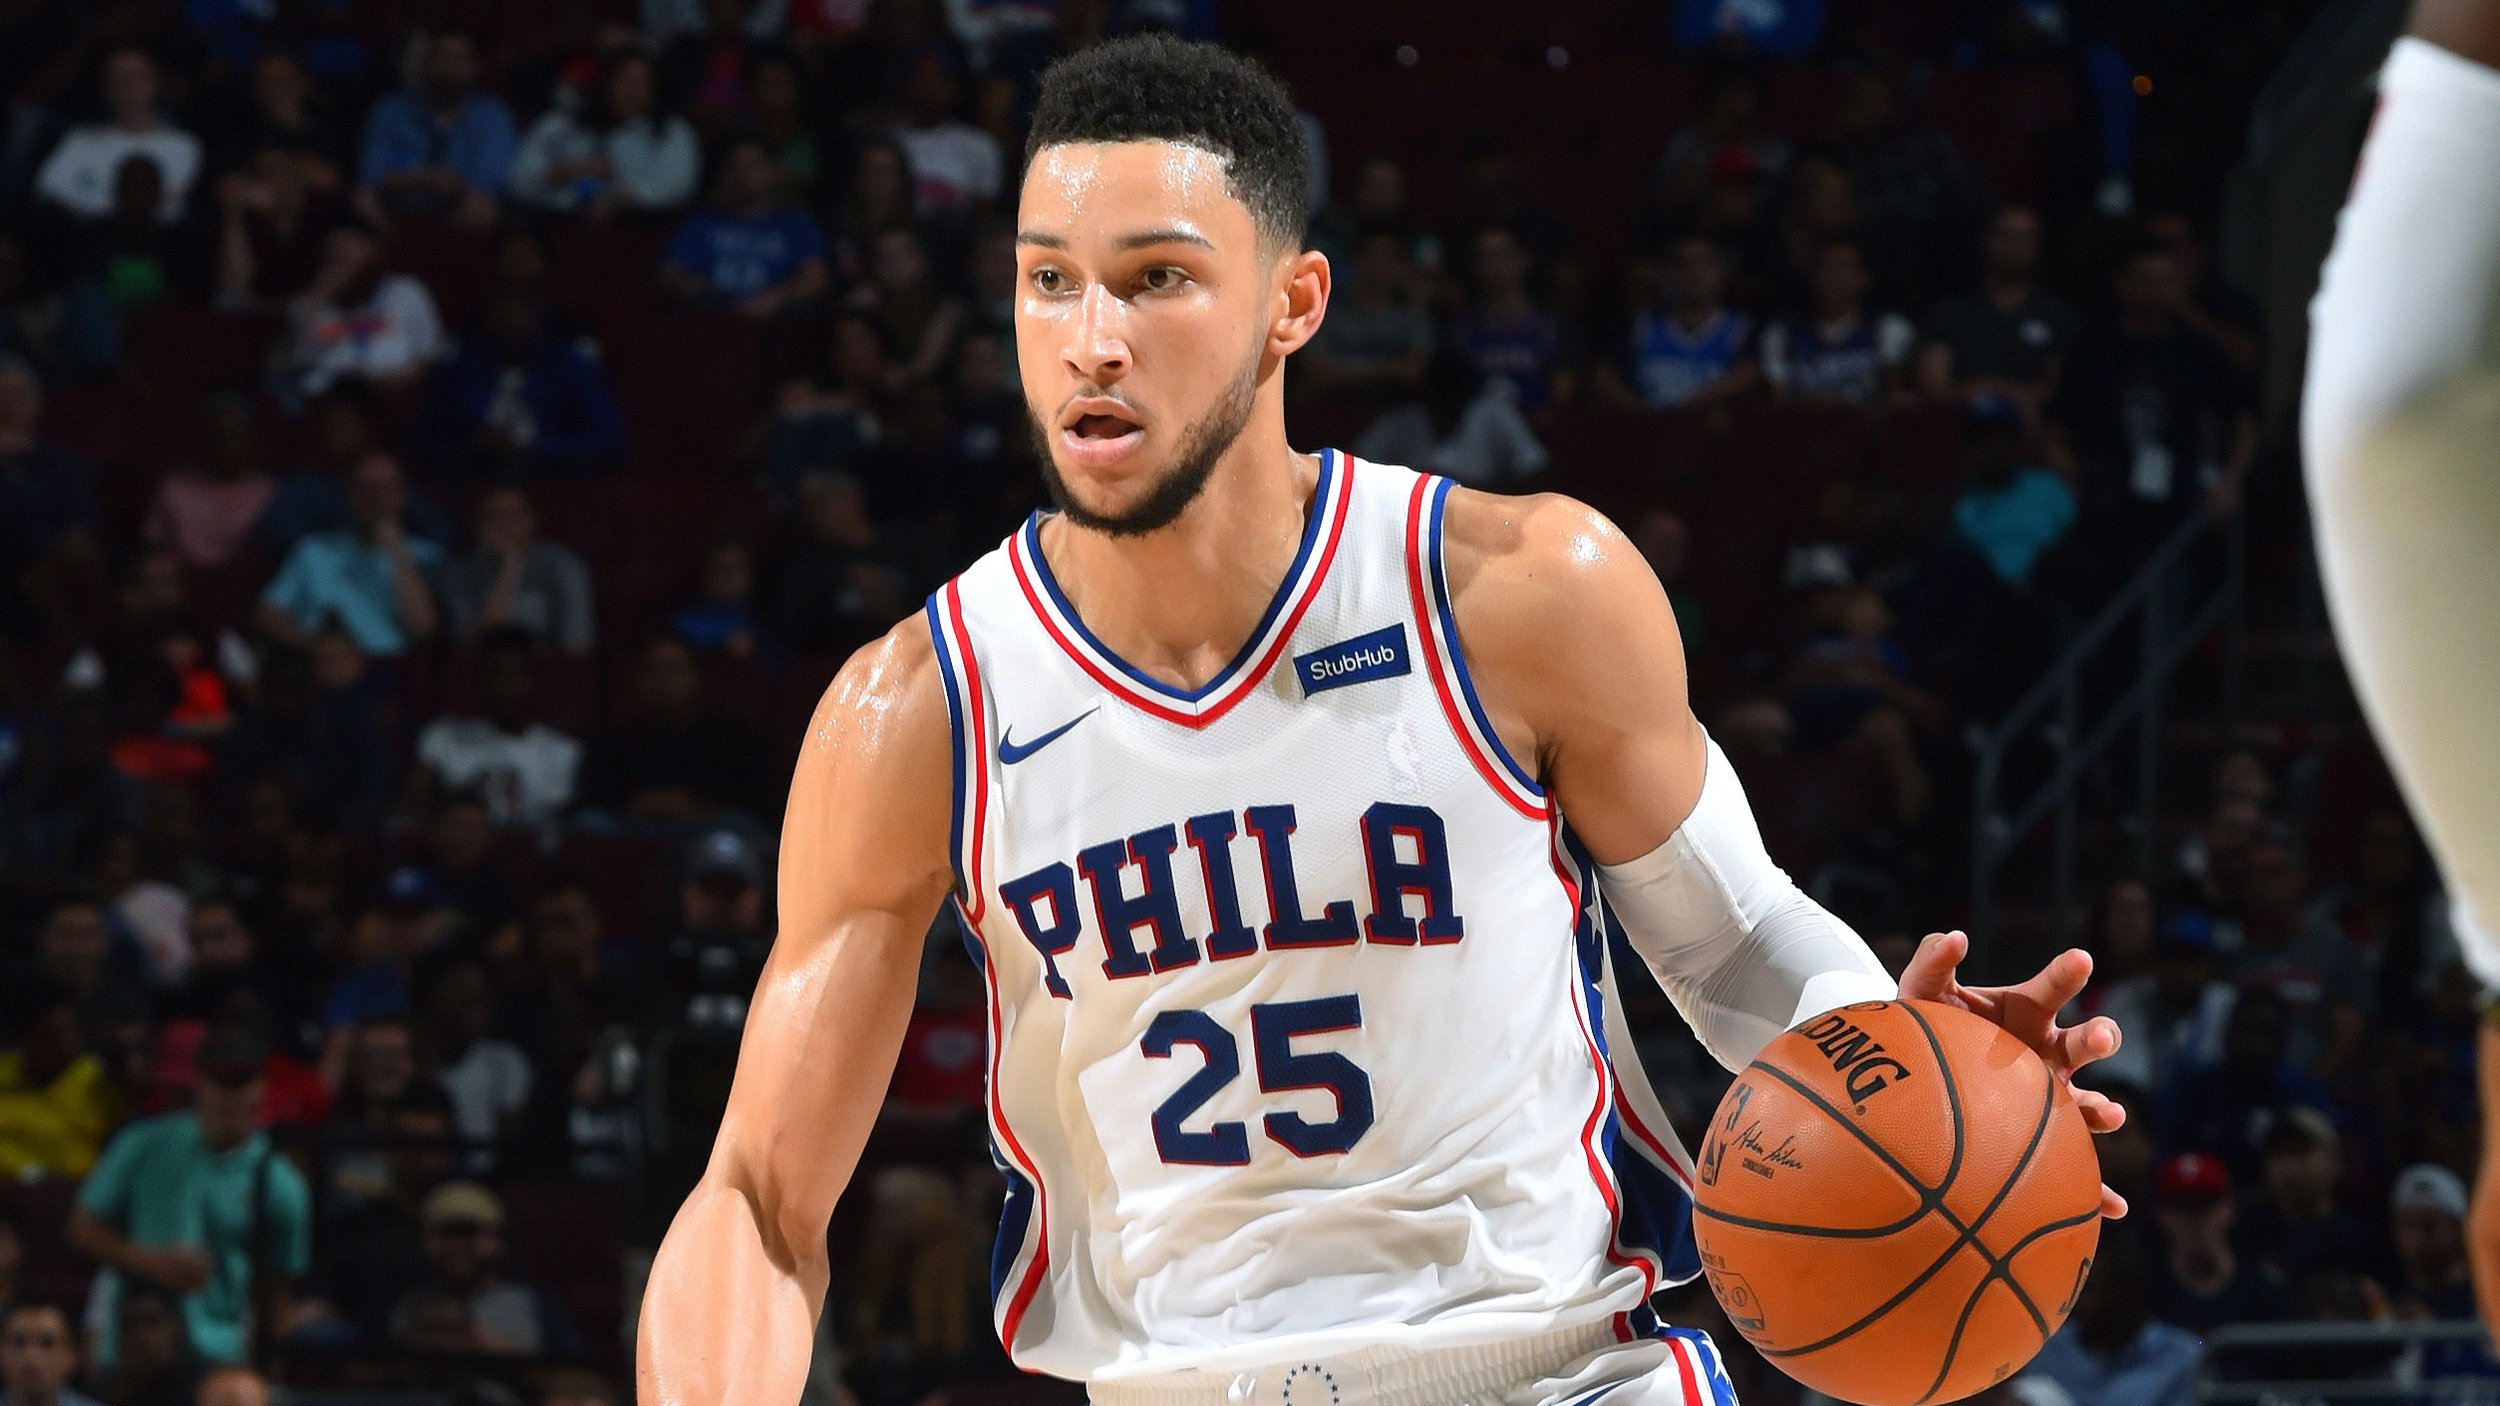 Ben Simmons - Point Guard; Philadelphia 76ers